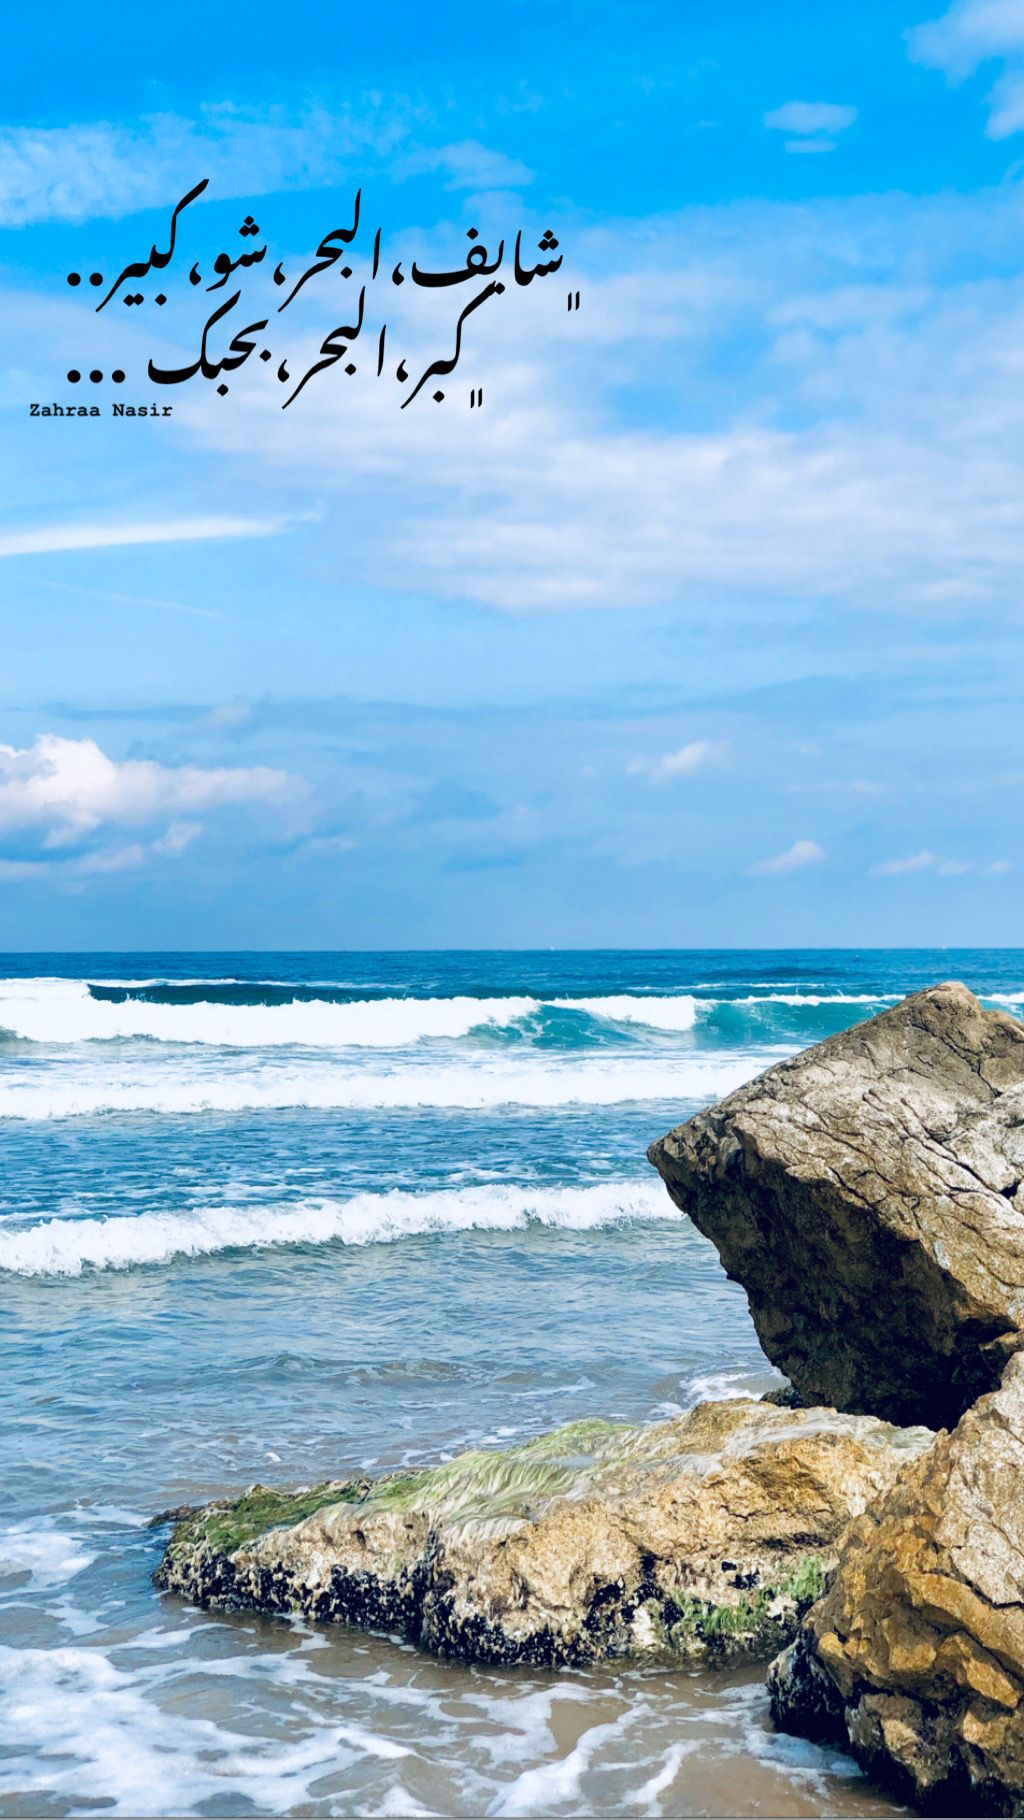 Inspirationalquotes Quotes شاي كوب اقتباسات رمزيات ستوريات افكار تصوير هدوء كلمات عبارات عبارات يوميه Relaxtime عزله Chi C Travel Beach Outdoor